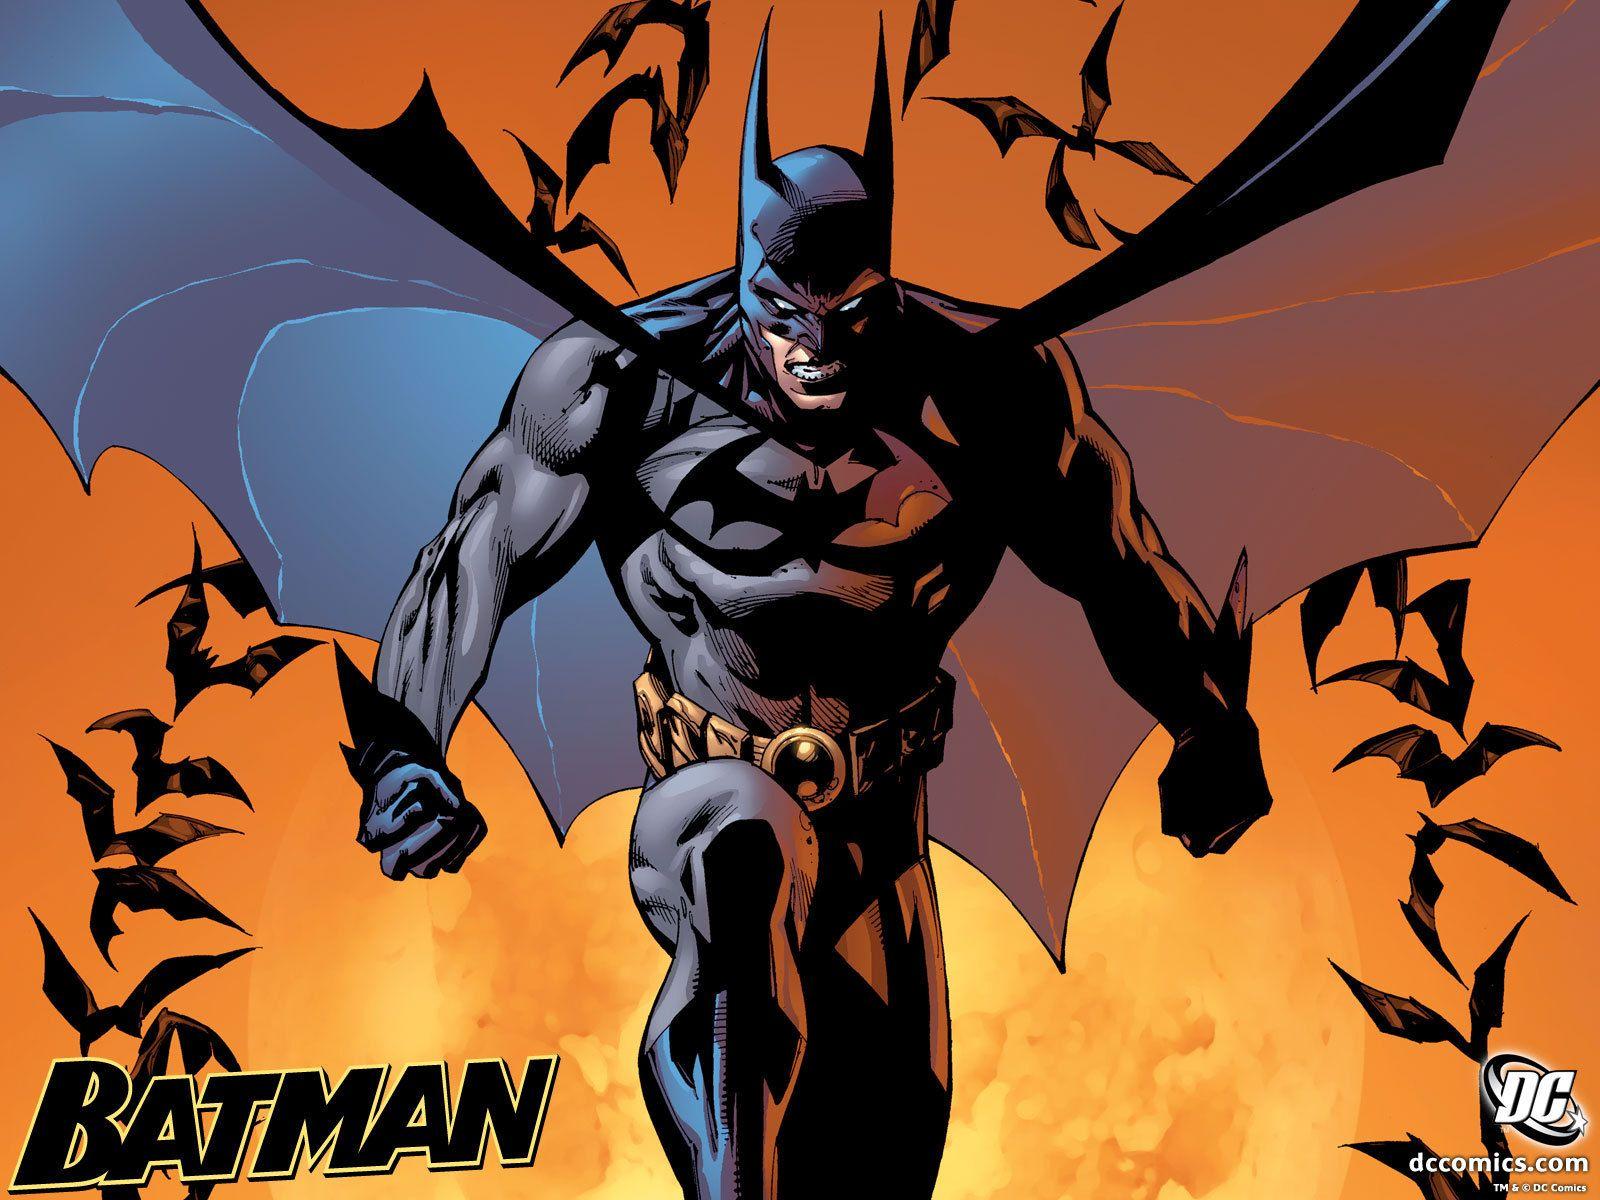 Famous Batman For Free Mac Image Wallpaper Download ... Batman Comic Cover Wallpaper